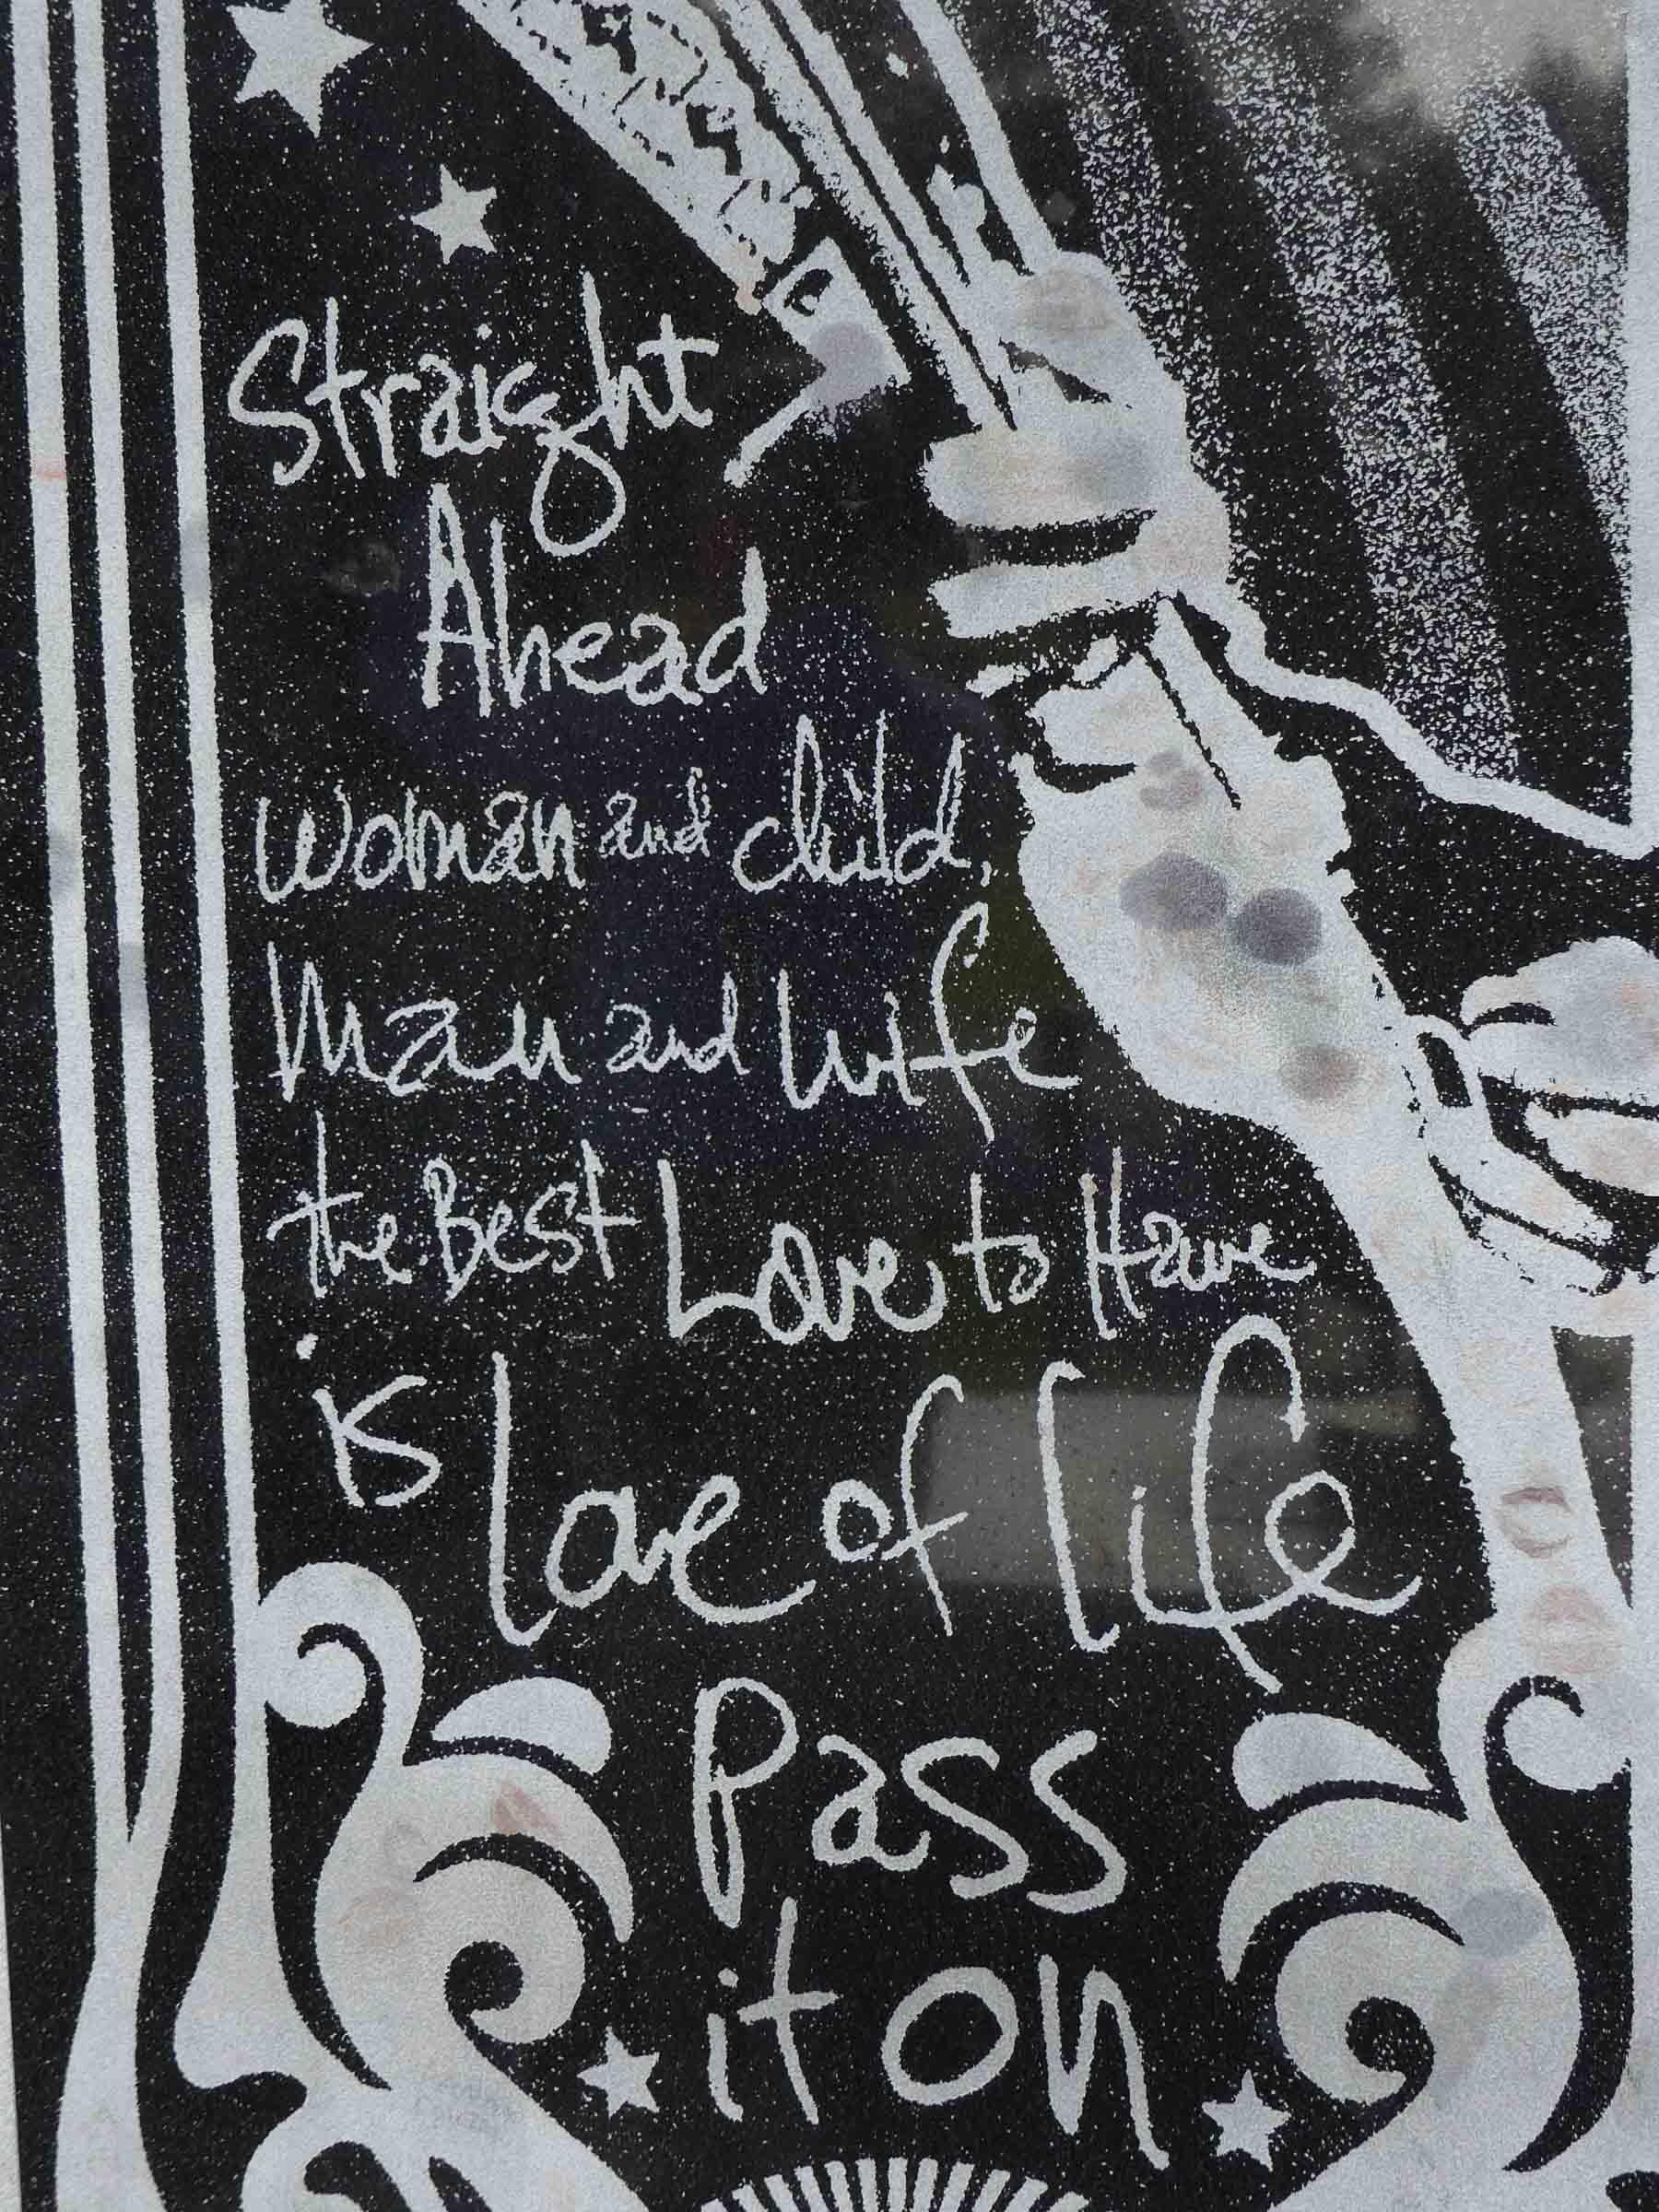 Marble slab with image of handwritten song lyrics